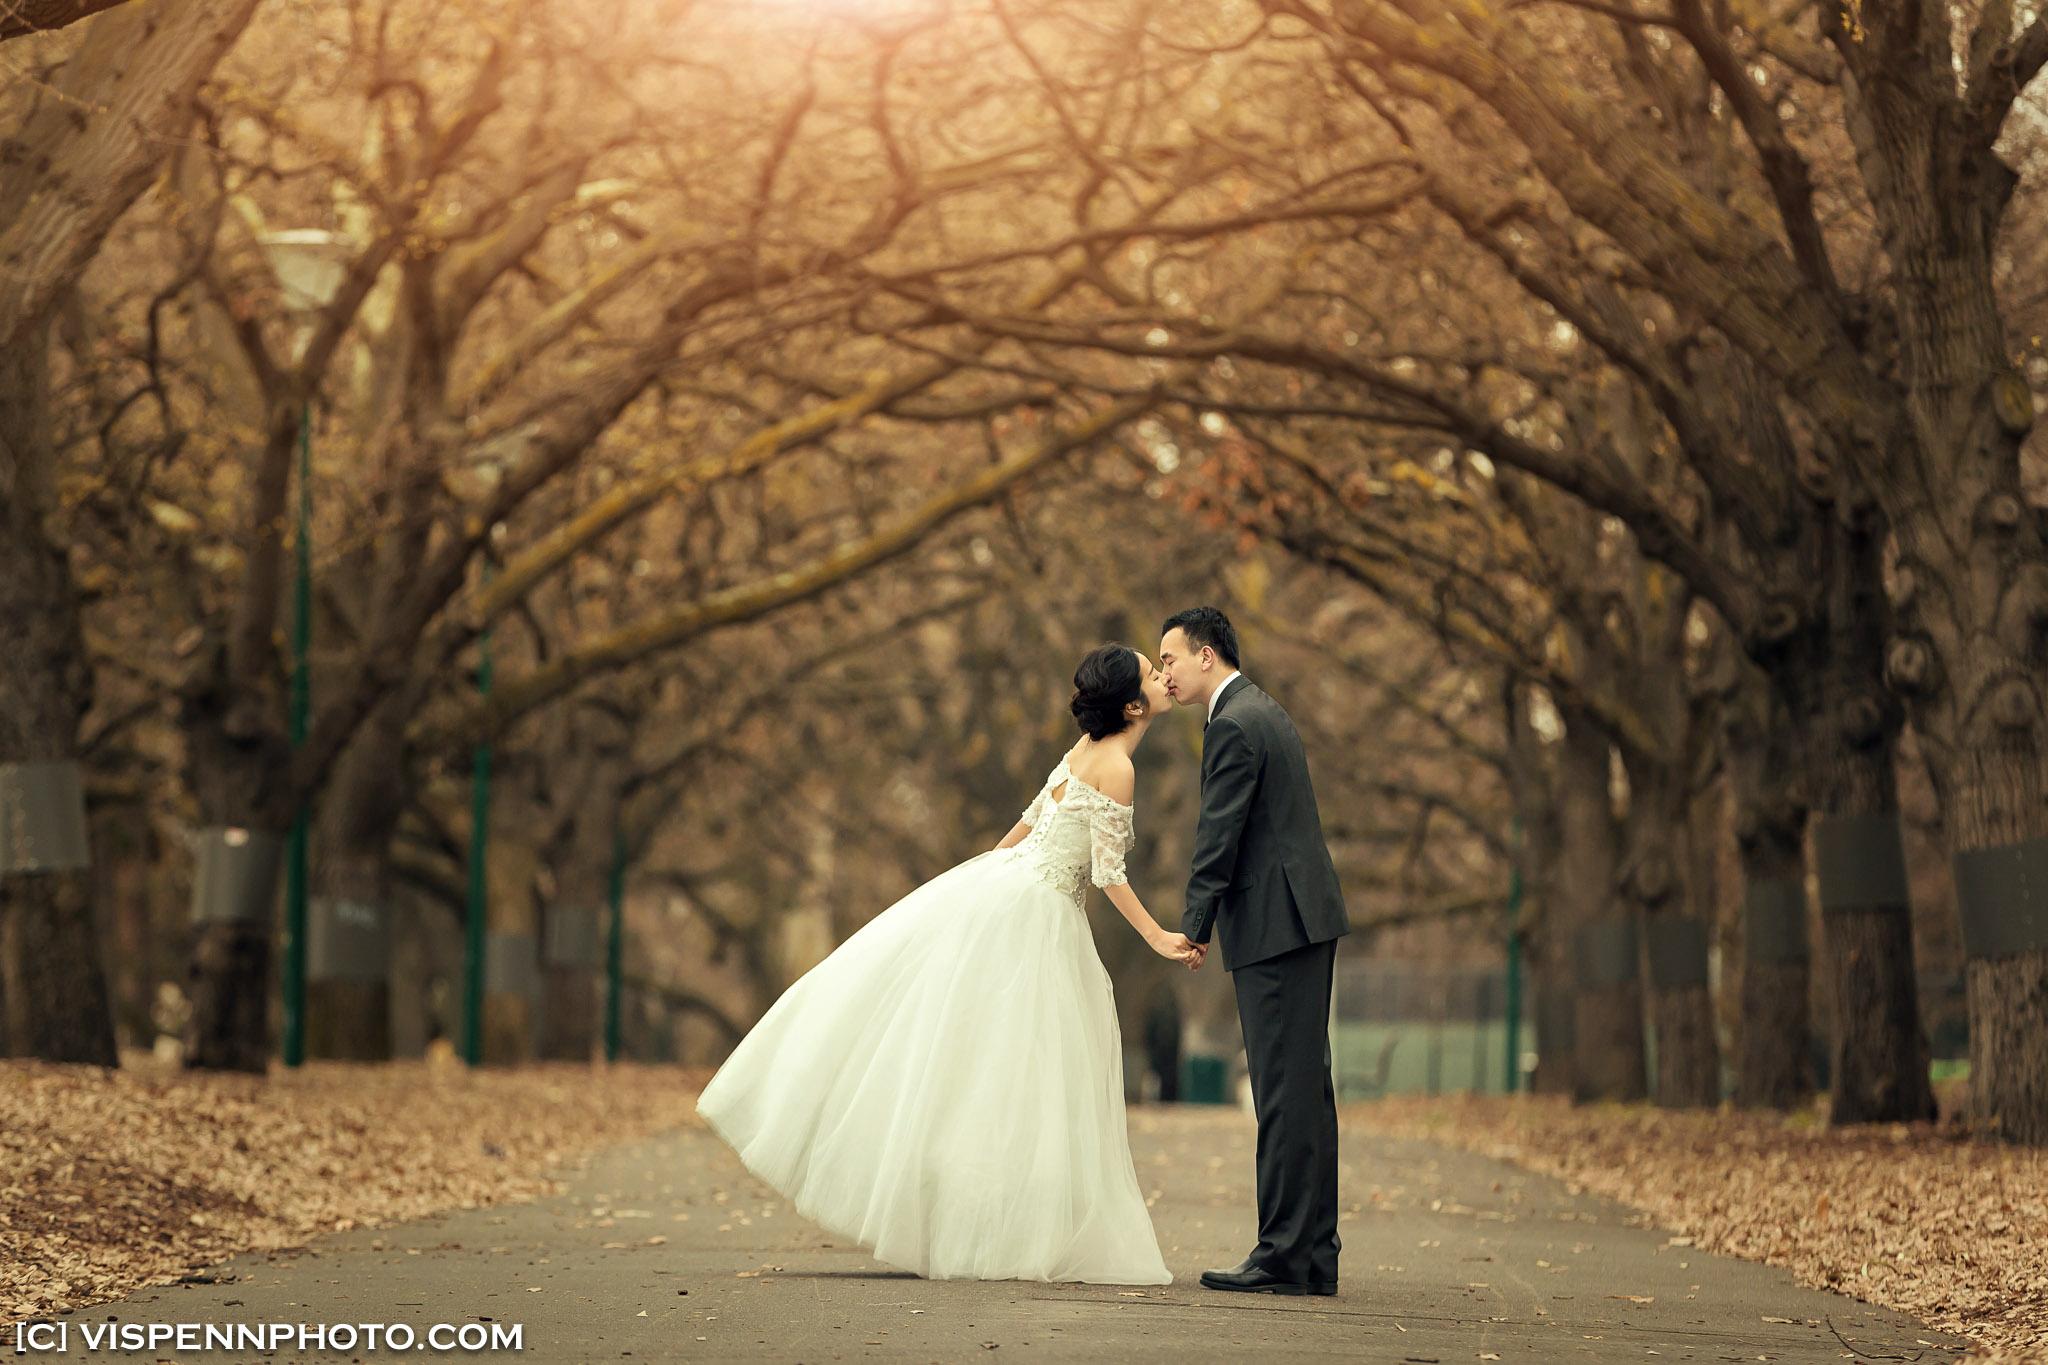 PRE WEDDING Photography Melbourne VISPENN 墨尔本 婚纱照 结婚照 婚纱摄影 VISPENN XXD 0476